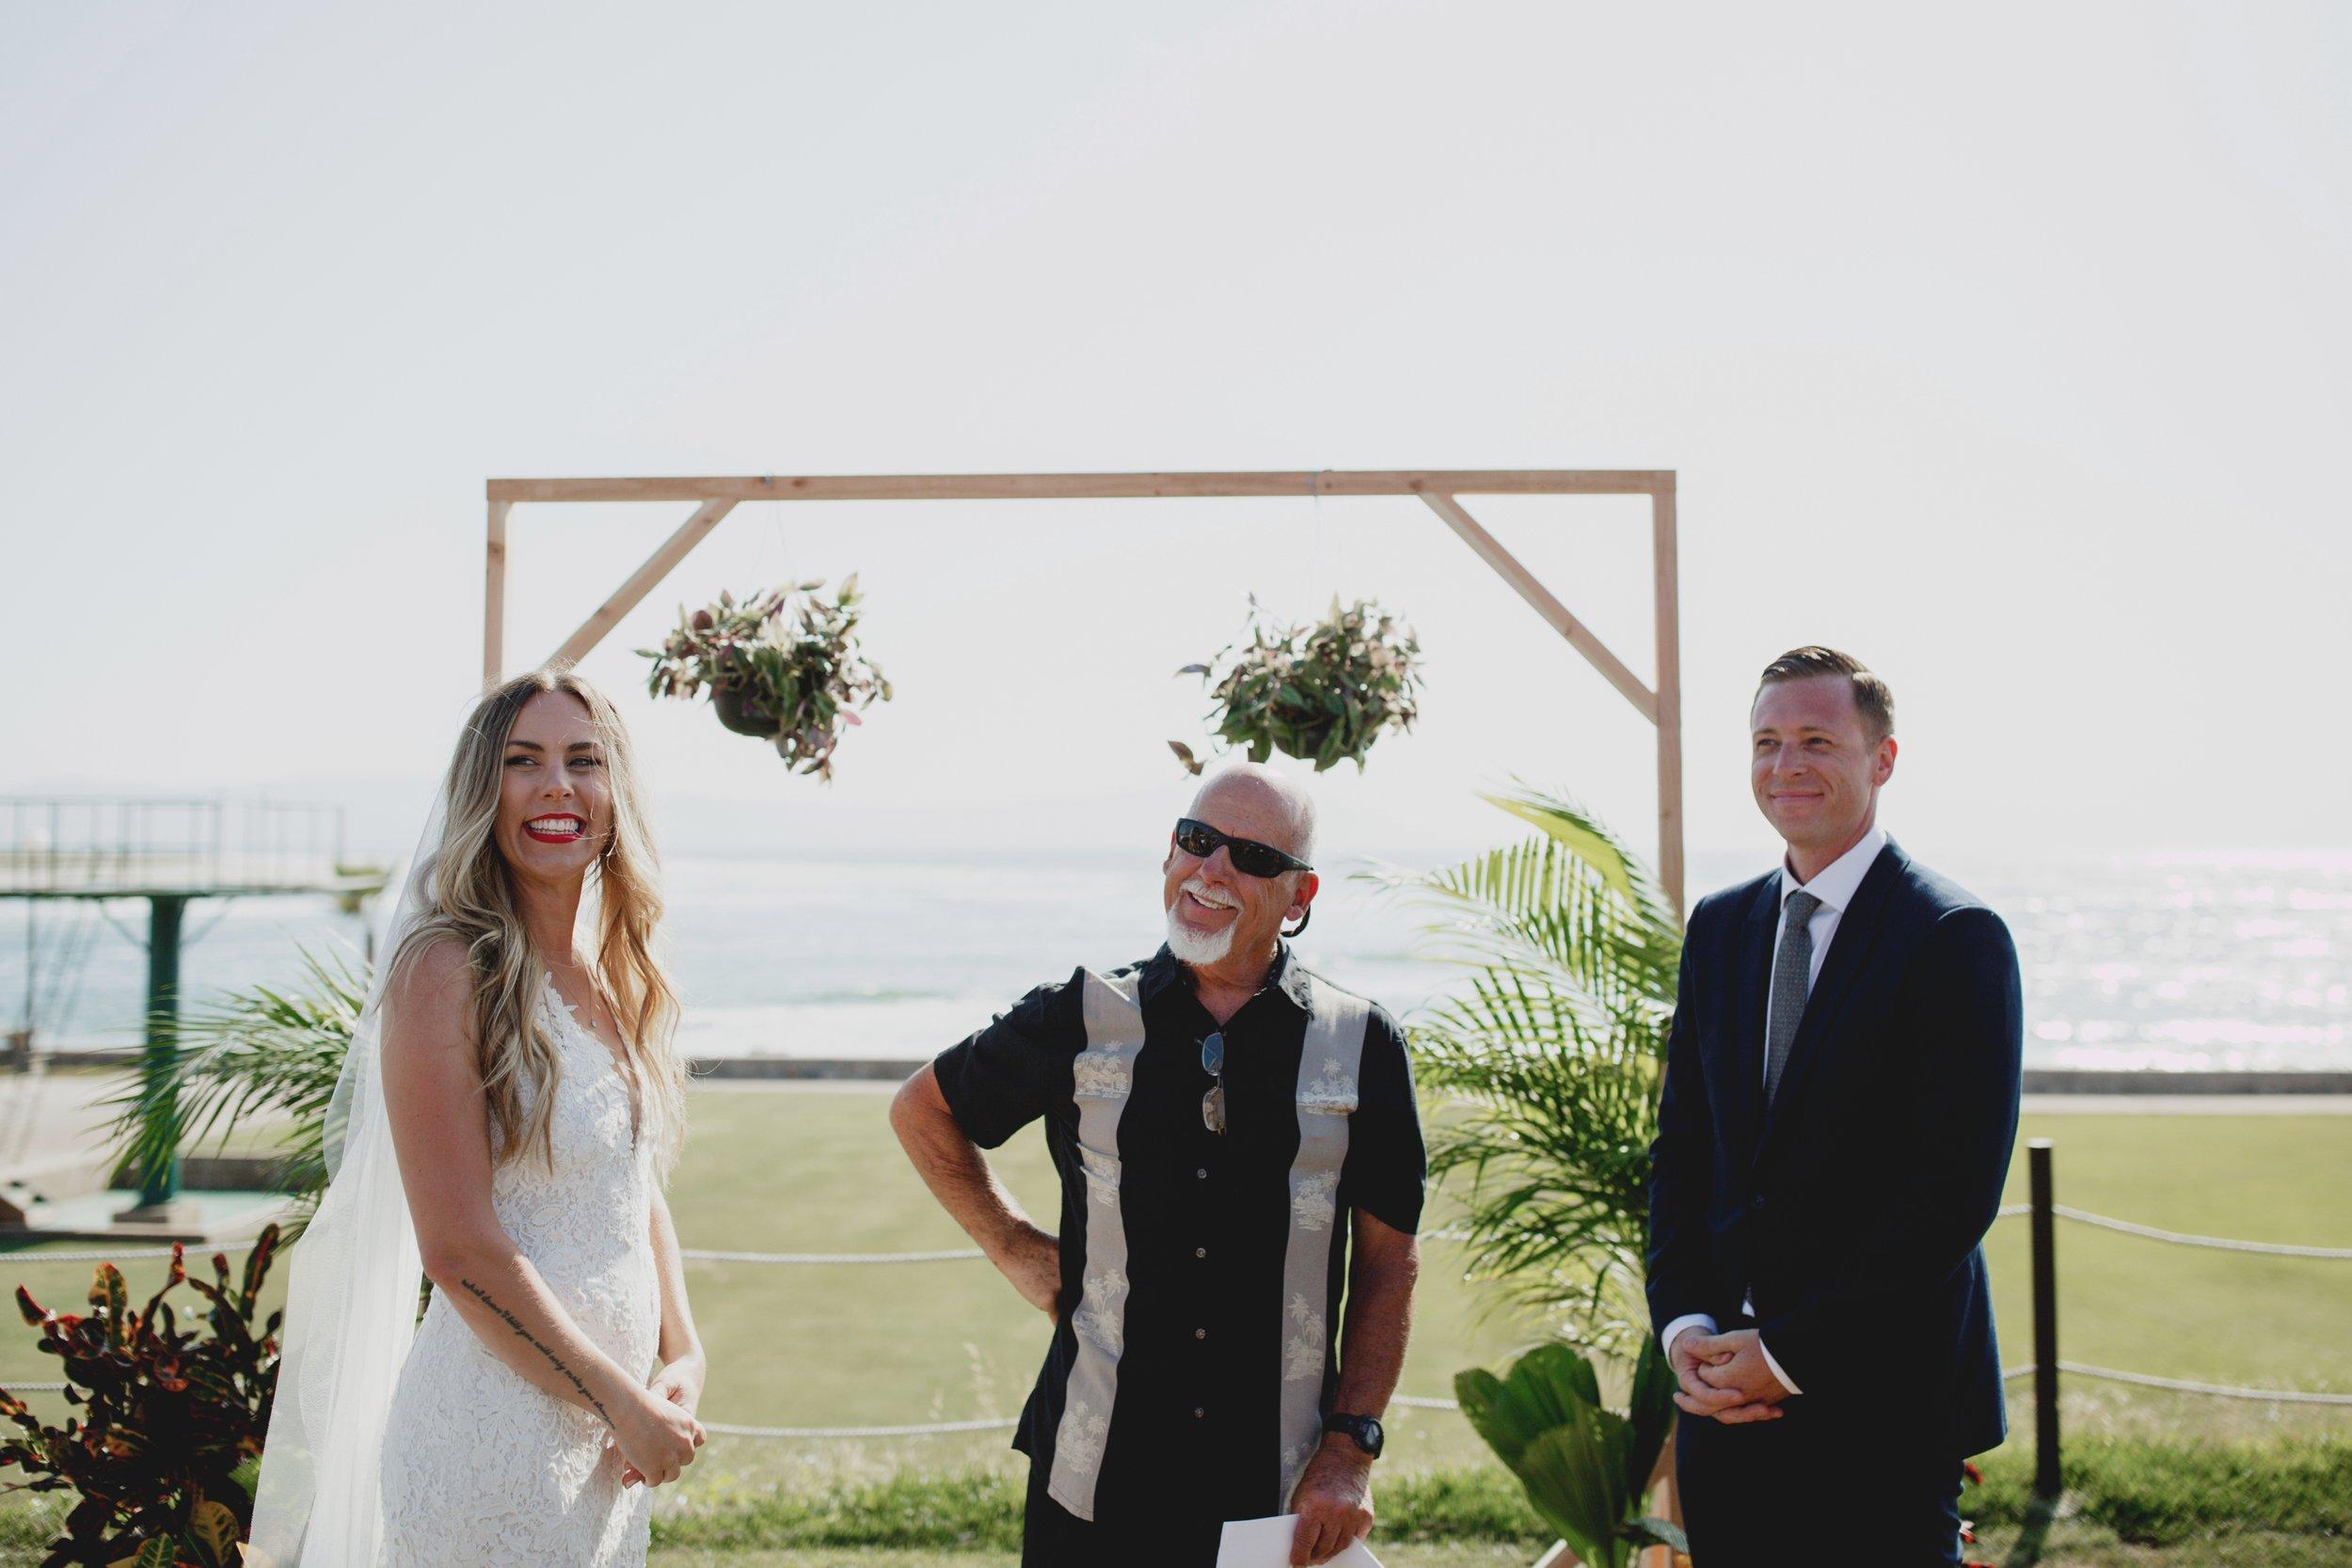 amandavanvels_ensenada_mexico_wedding_036.jpg